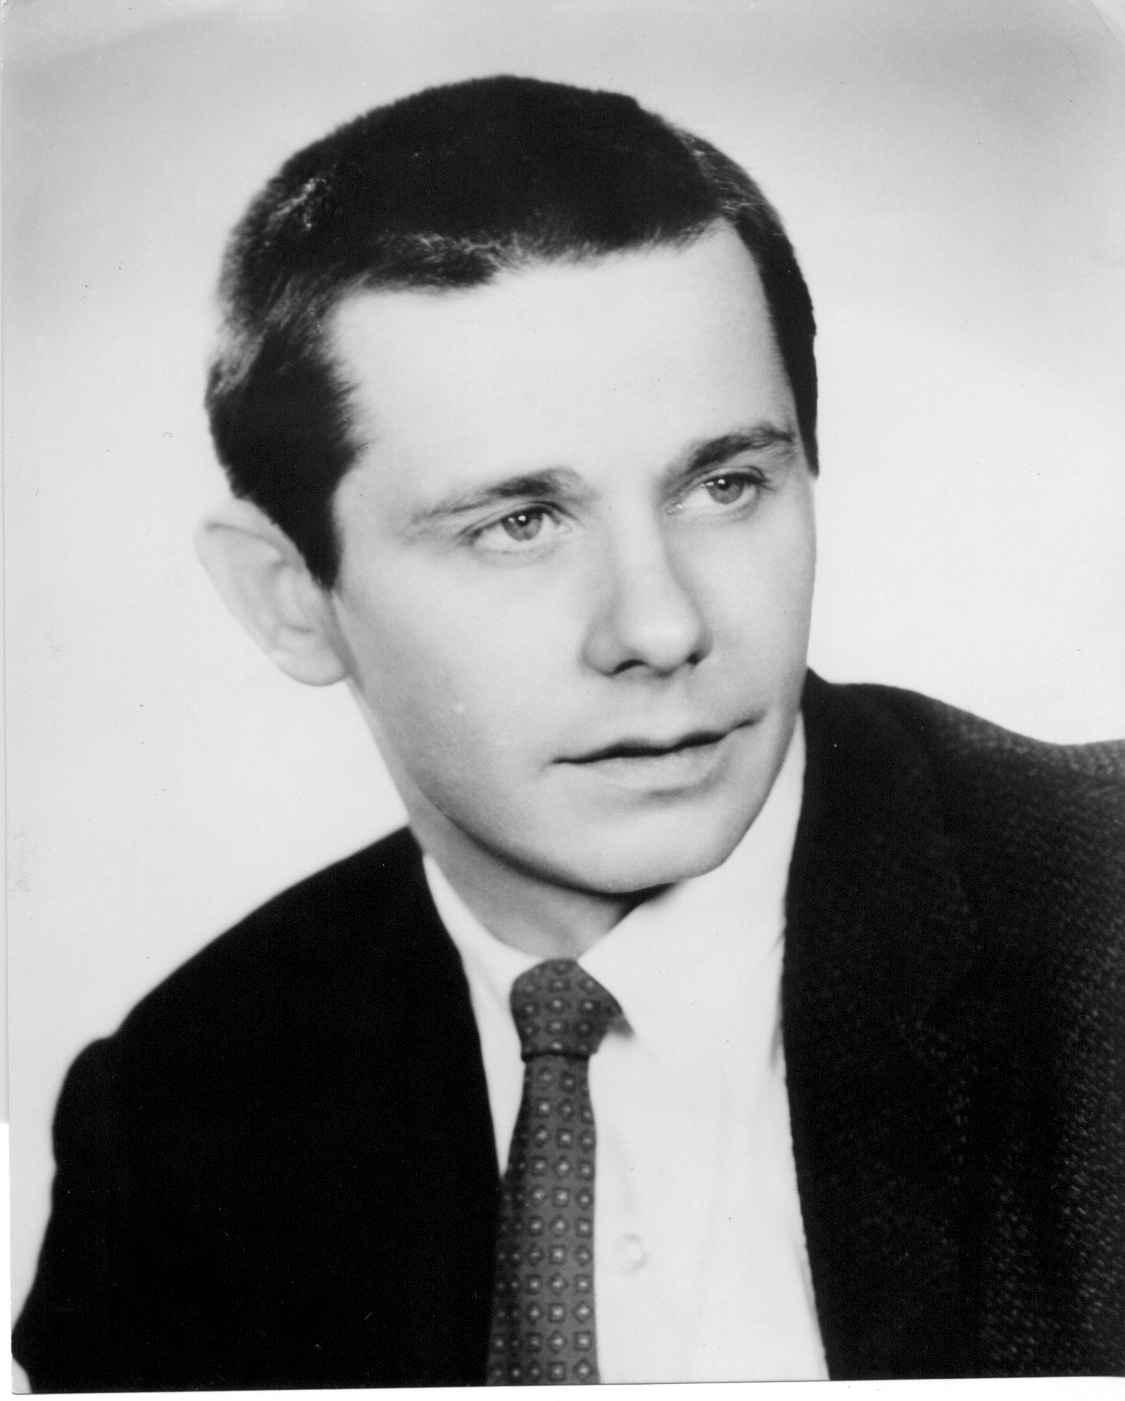 Robert Readick